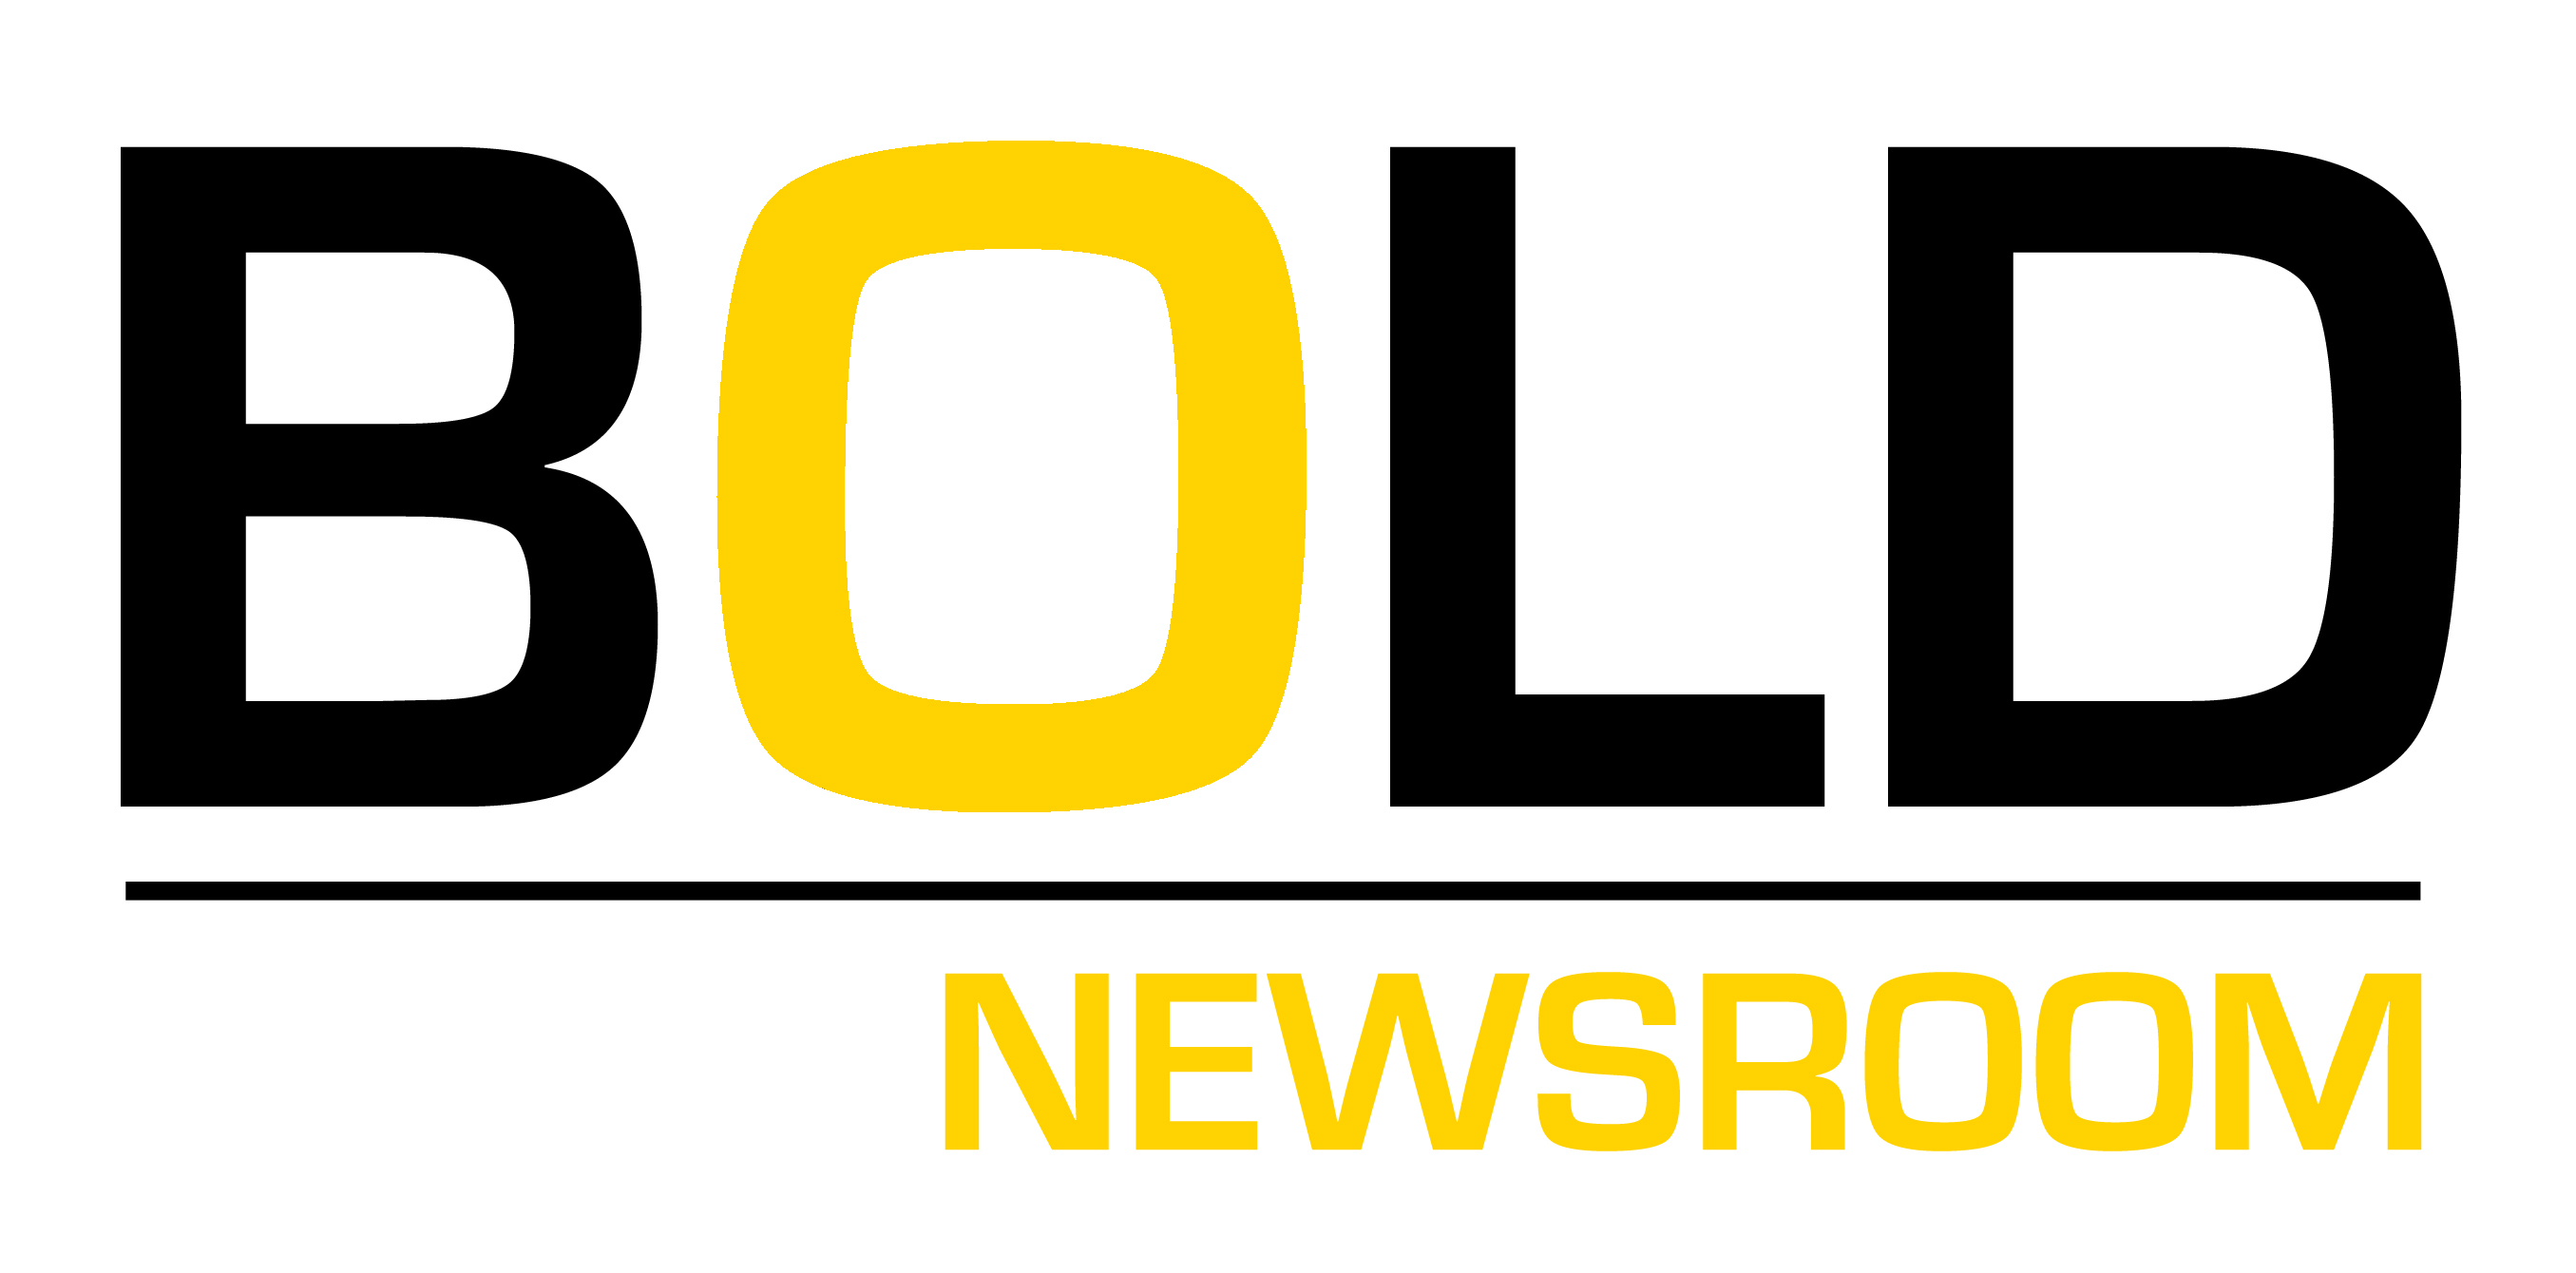 BOLD NEWSROOM